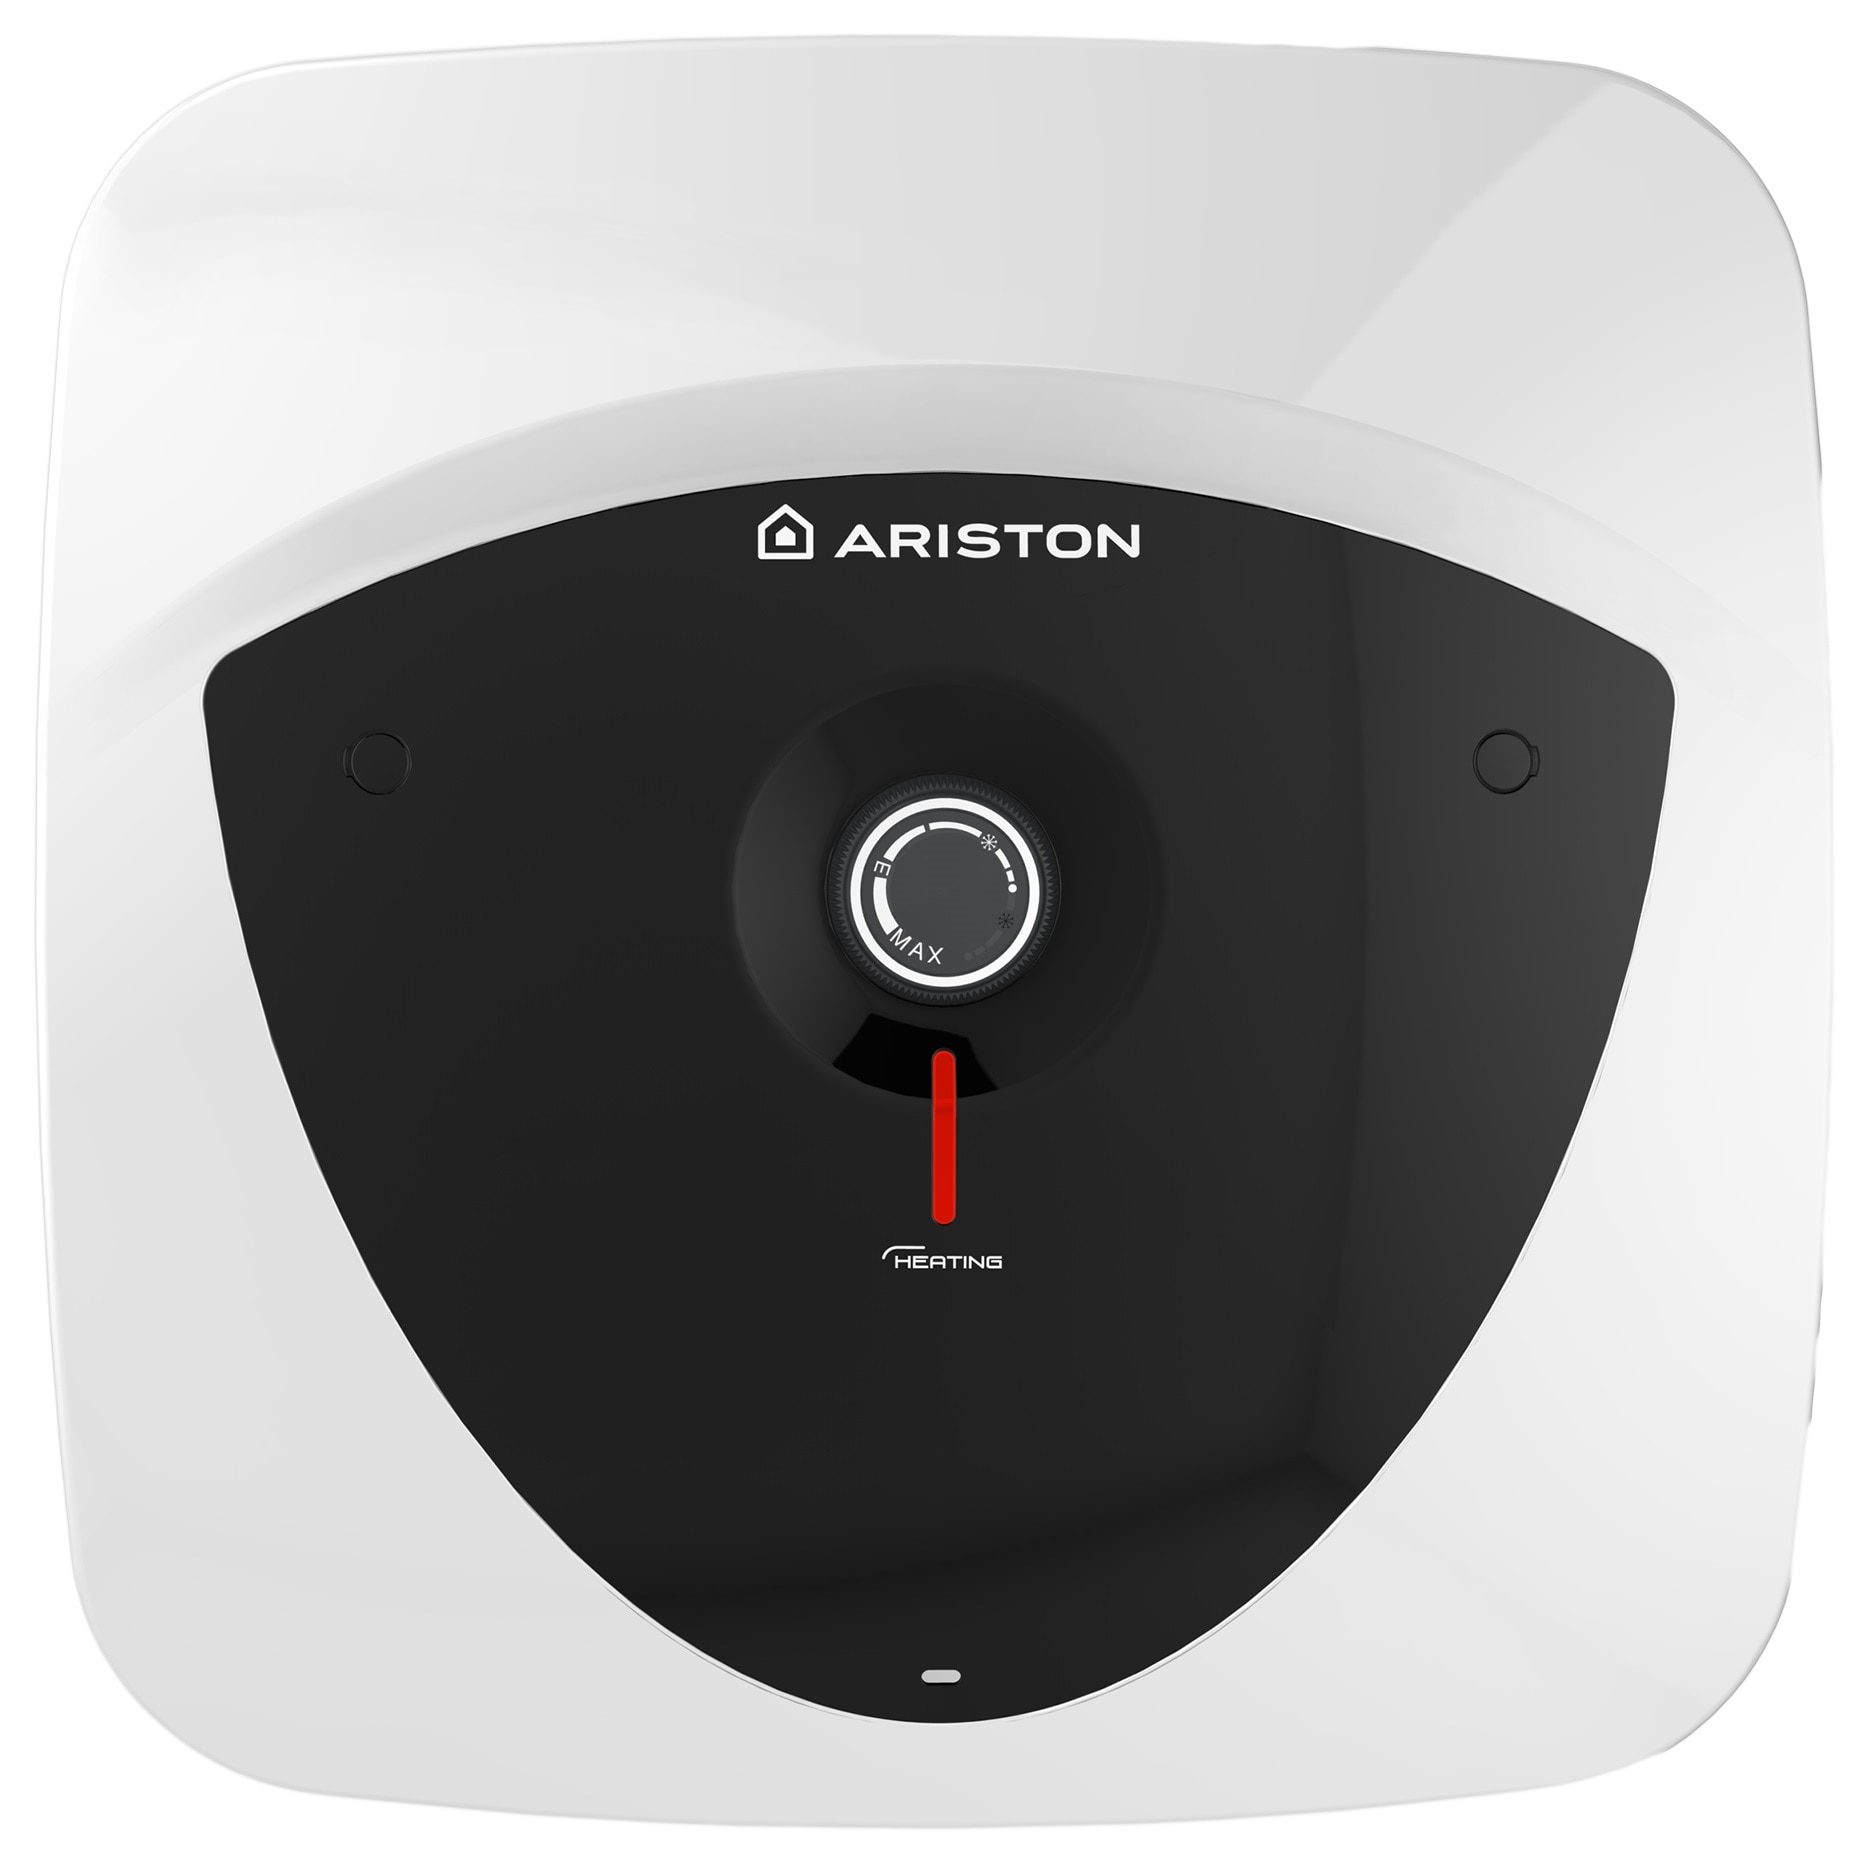 Fotografie Boiler electric Ariston Andris LUX 30 EU, 30 l, 1500 W, Led iluminat, Protectie electrica IPX4, Montare deasupra chiuvetei, Reglaj extern de temperatura